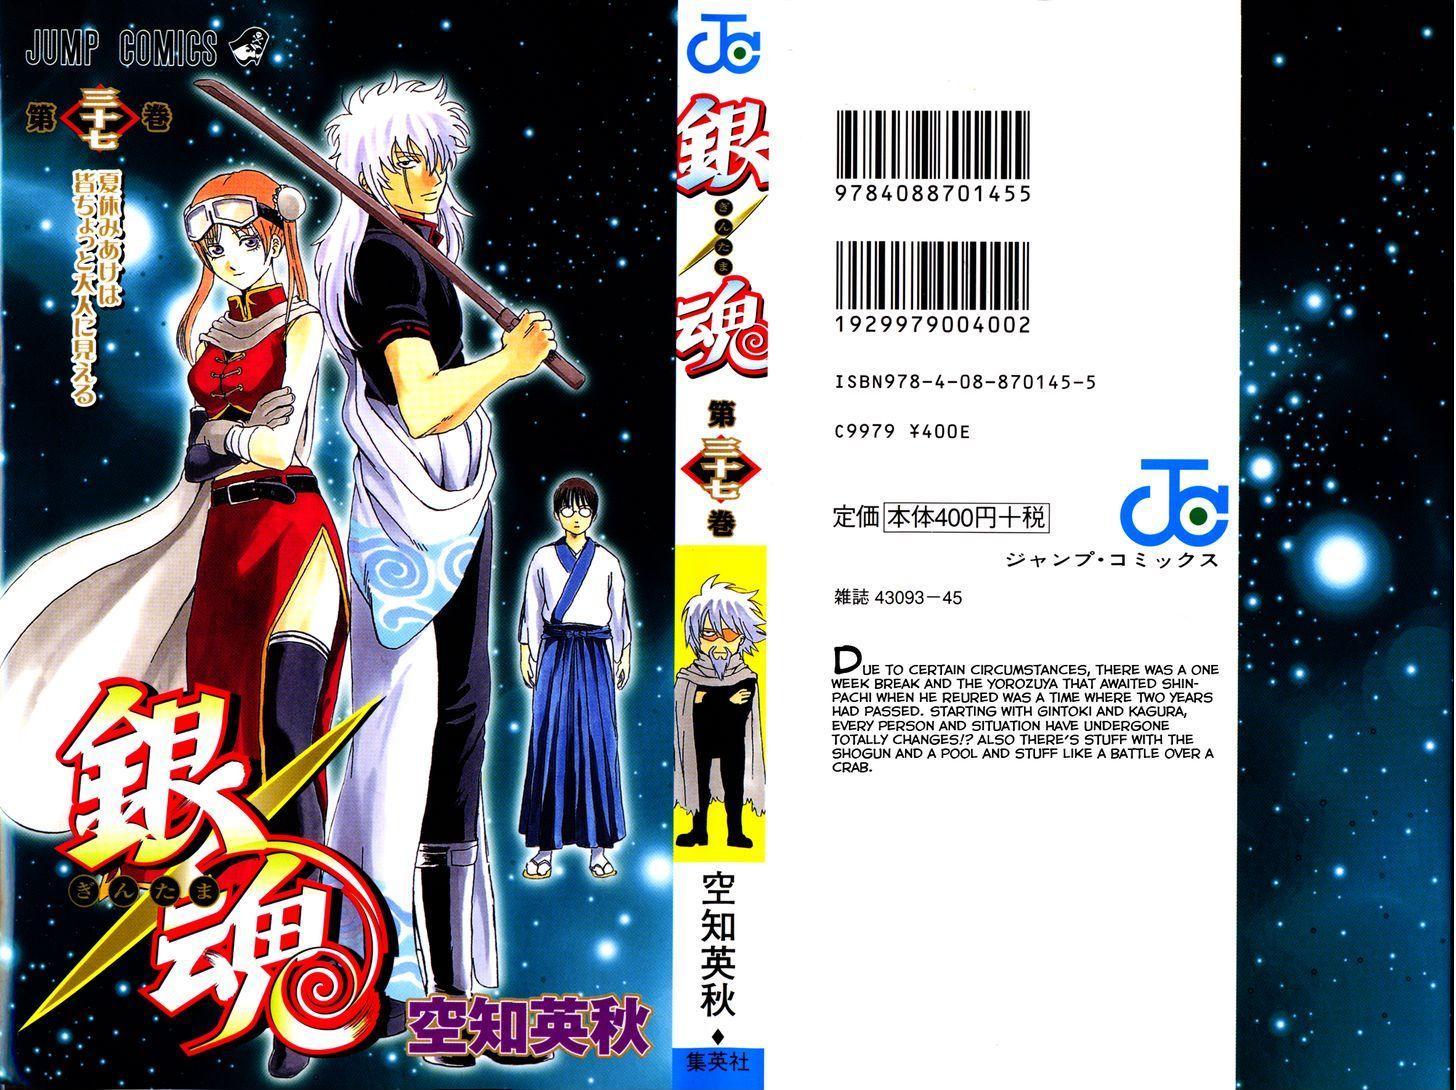 http://im.nineanime.com/comics/pic9/18/210/17135/Gintama3190670.jpg Page 1